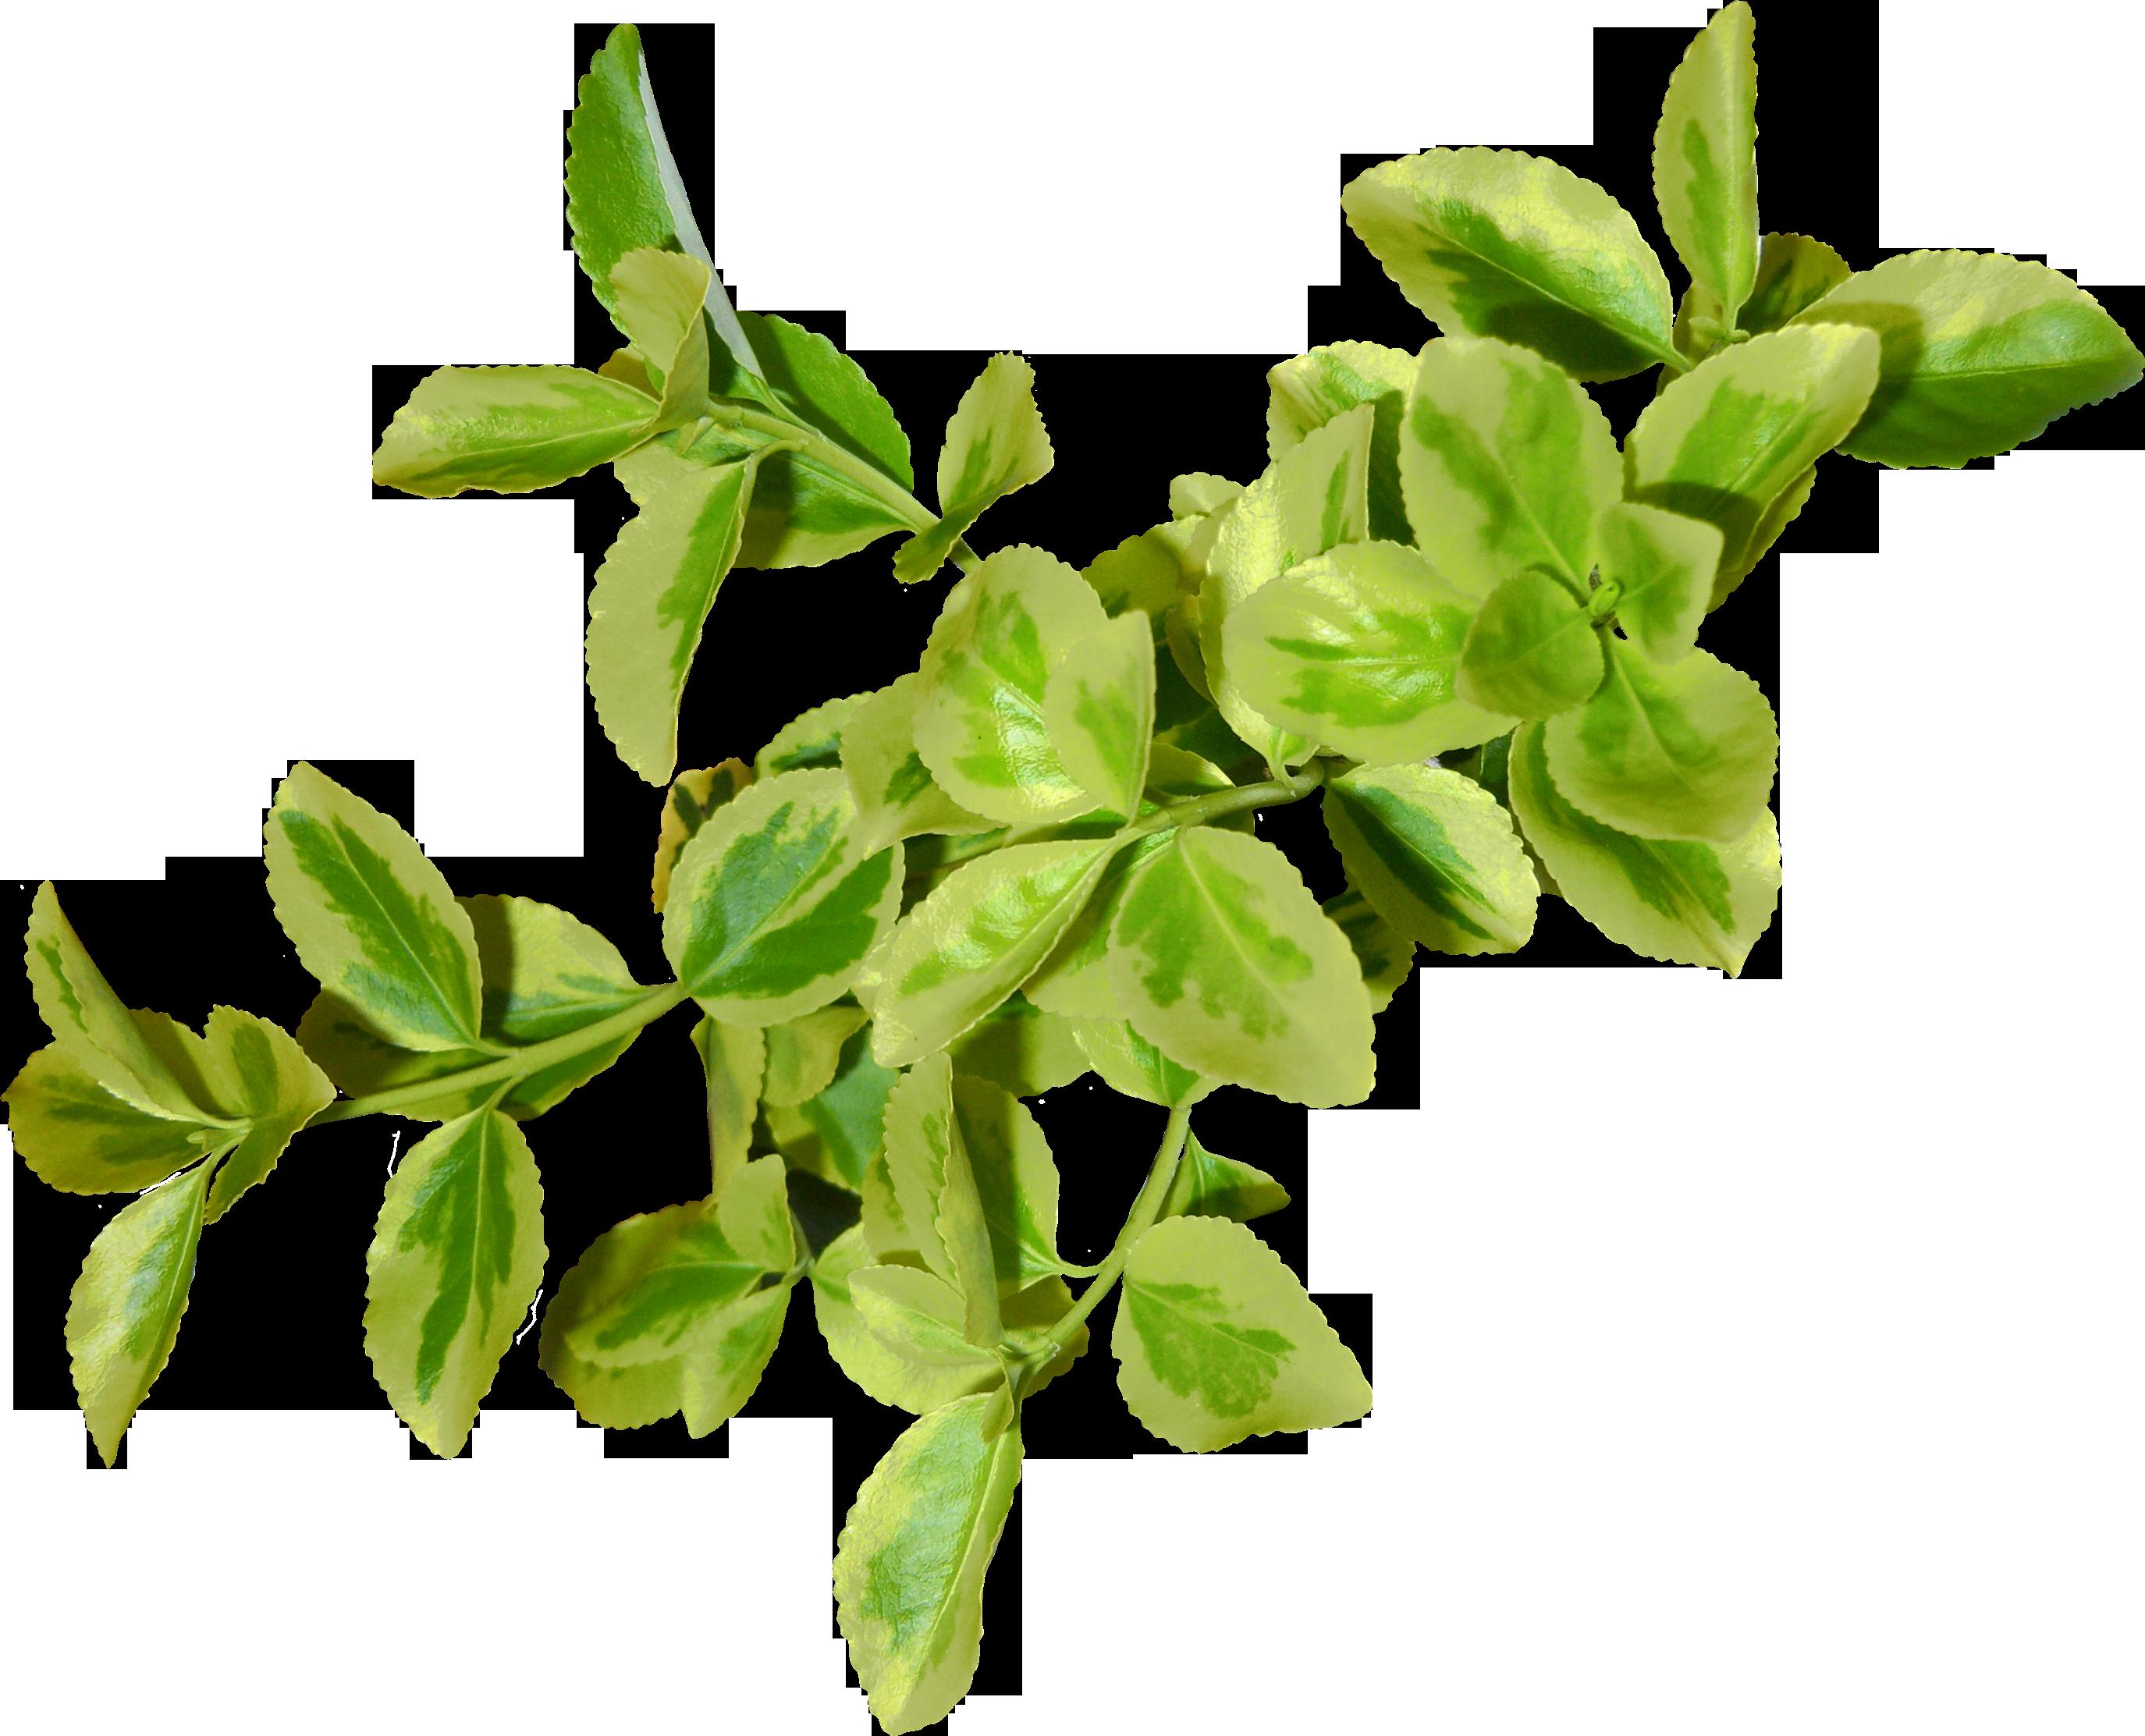 Green Leaves Png Image Green Leaf Wallpaper Green Leaves Leaves